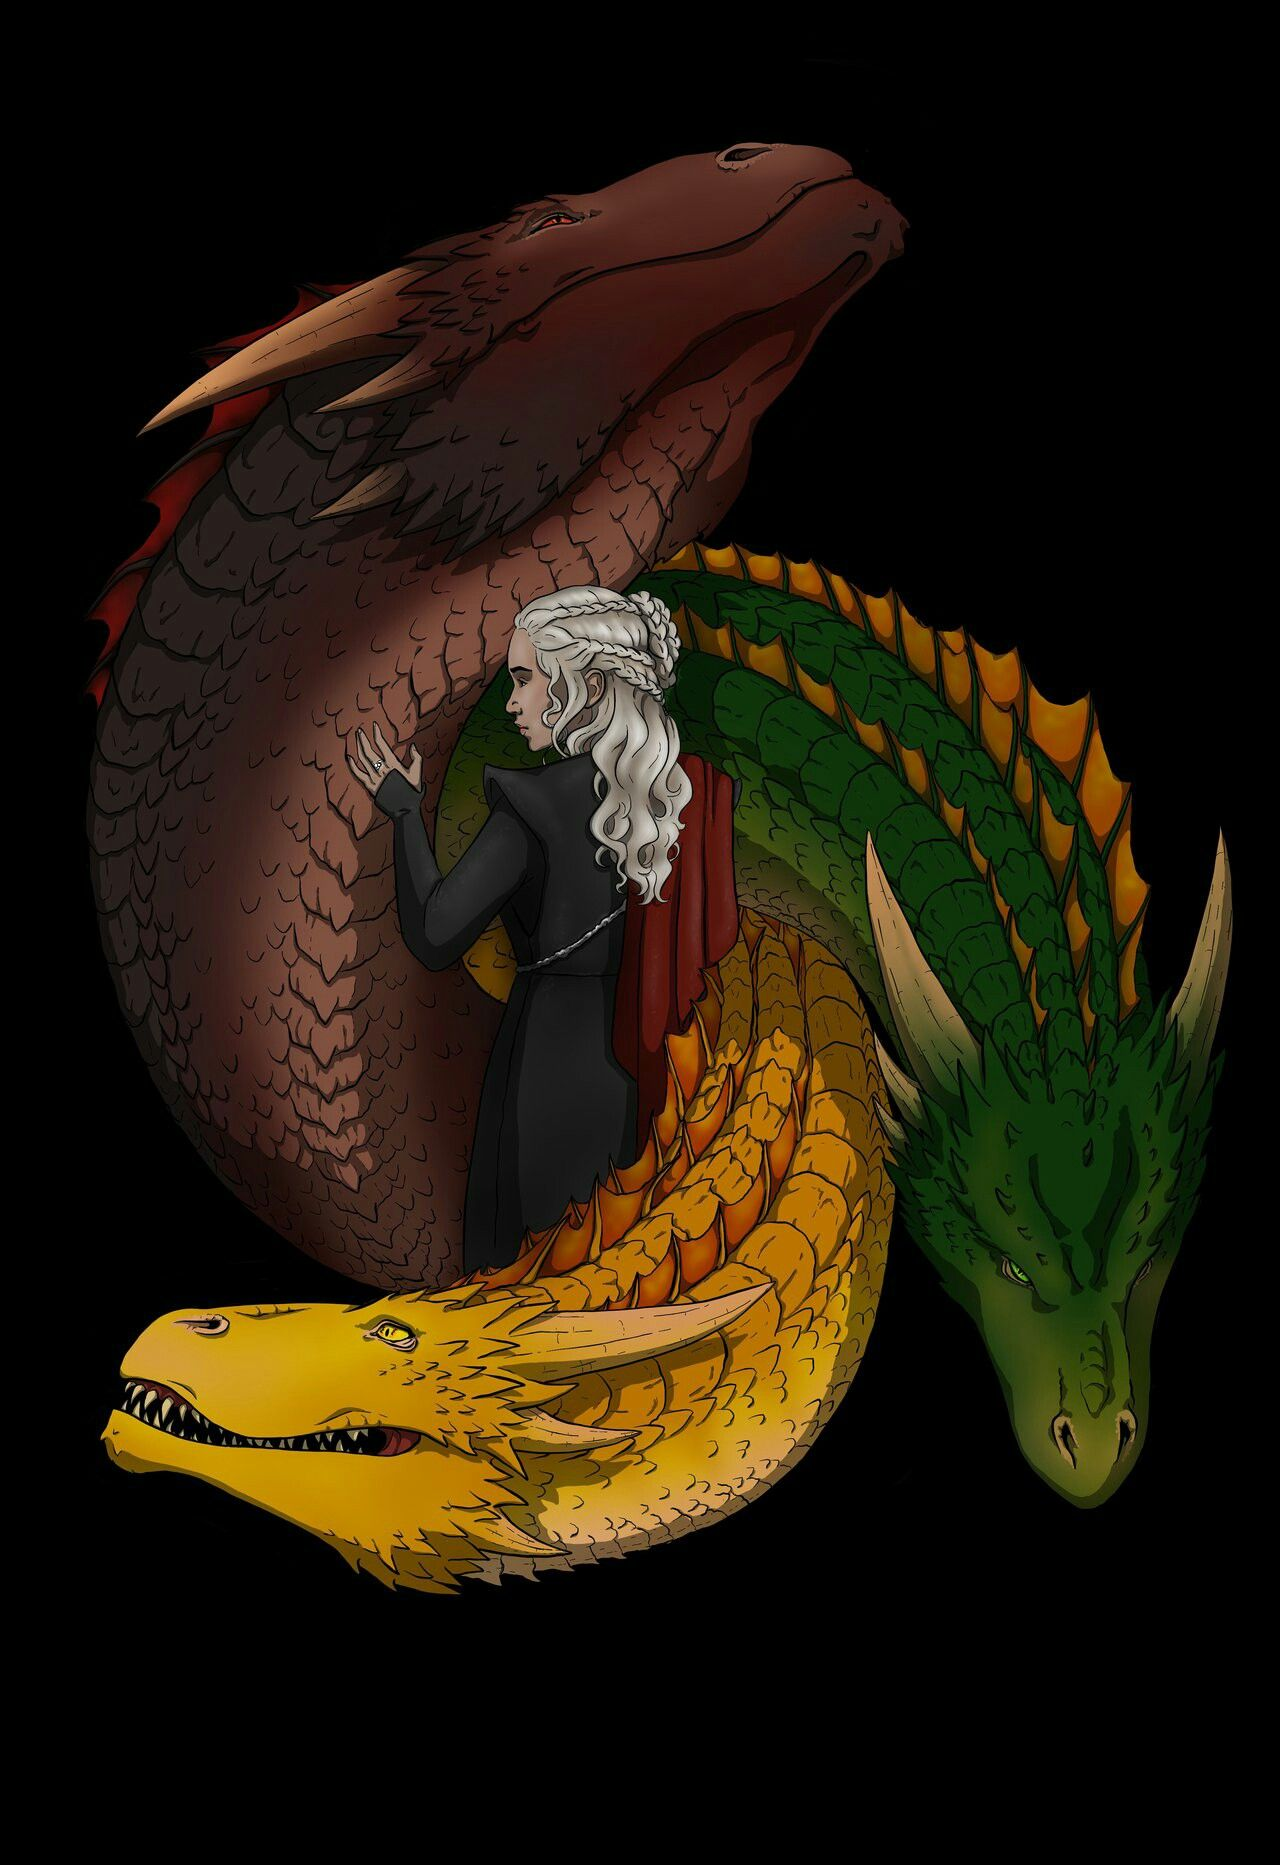 best sneakers d8498 e262d Game of thrones fanart wallpaper. Daenerys Targaryen, mother of dragons.